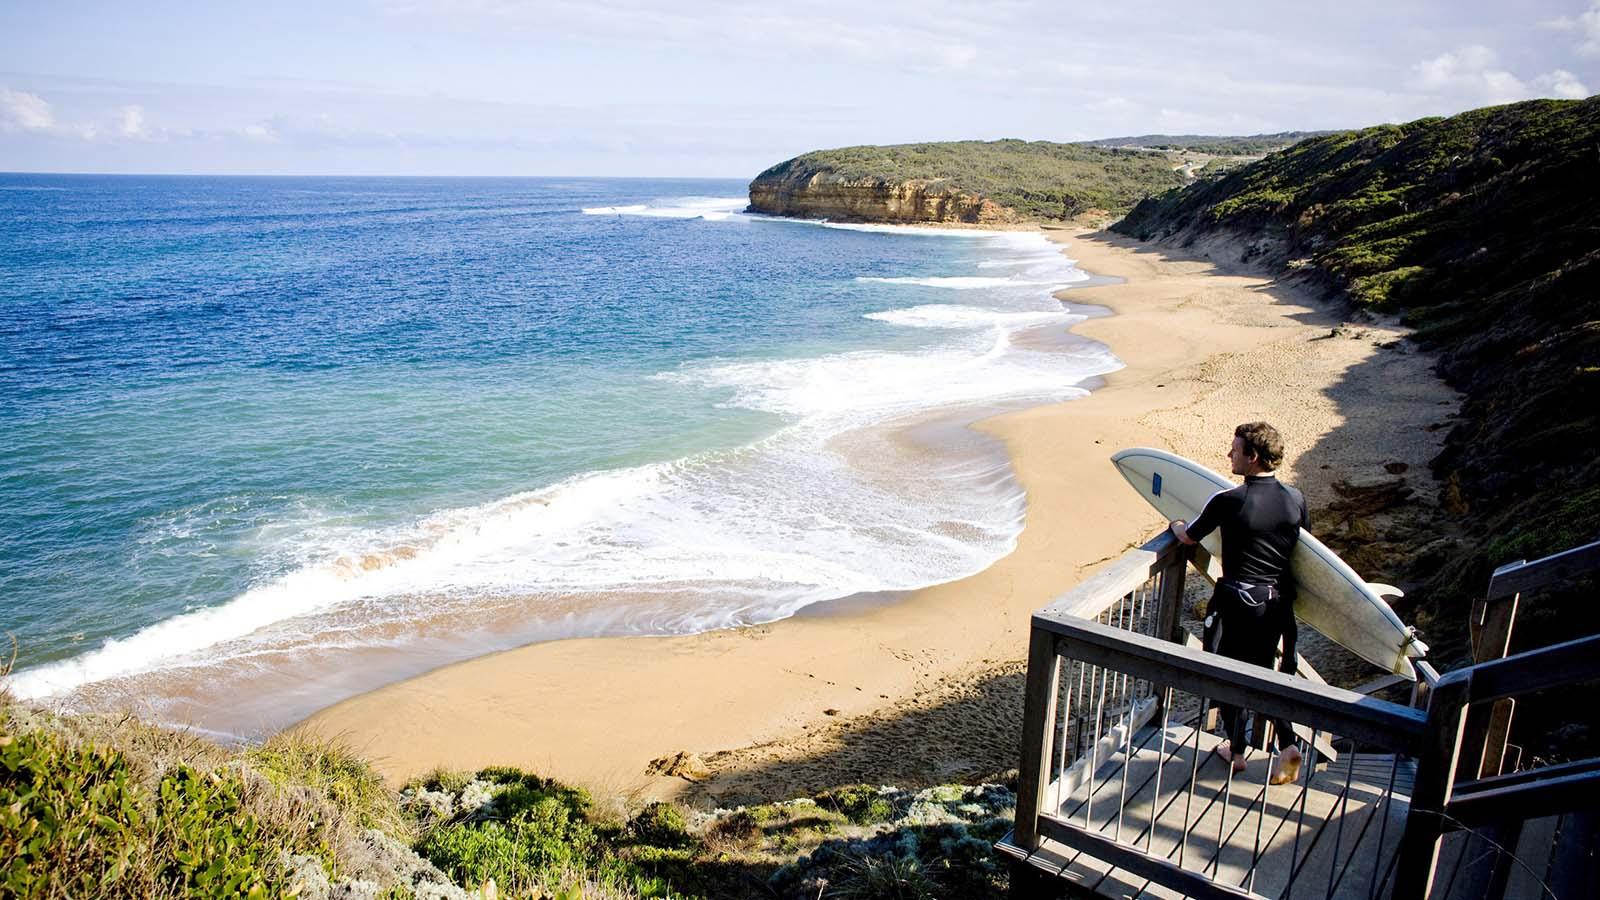 Surfer at Bells Beach, Torquay, Great Ocean Road, Victoria, Australia